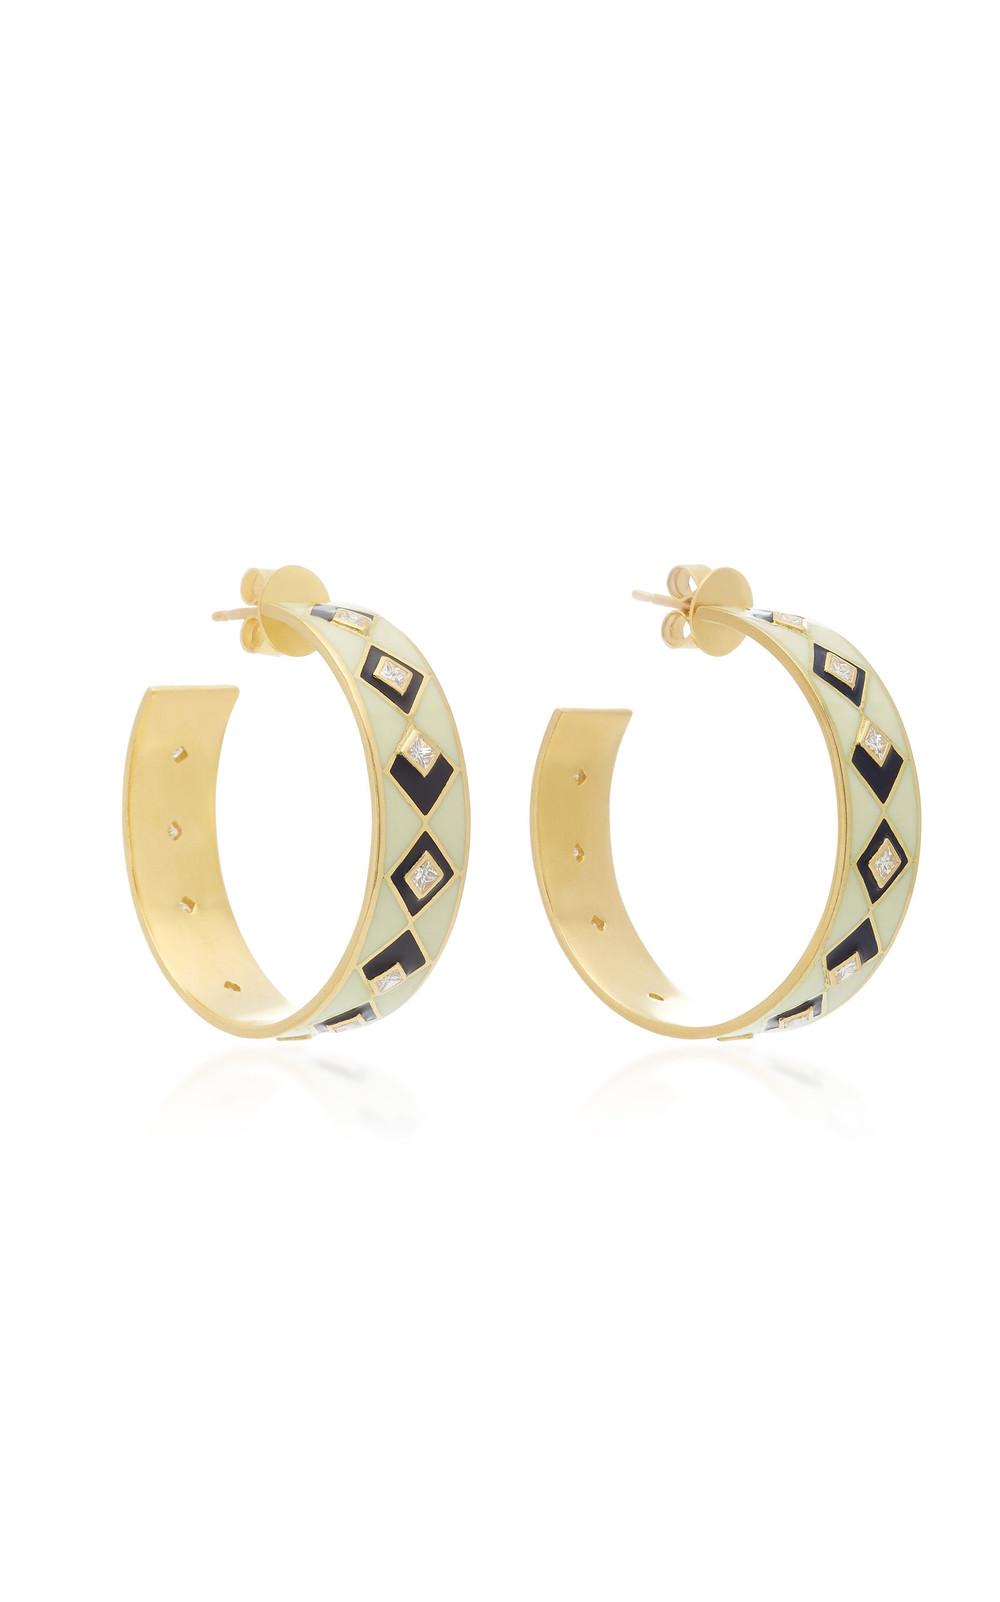 Amrapali Mosaic 18k Gold and Diamond Hoop Earrings in white